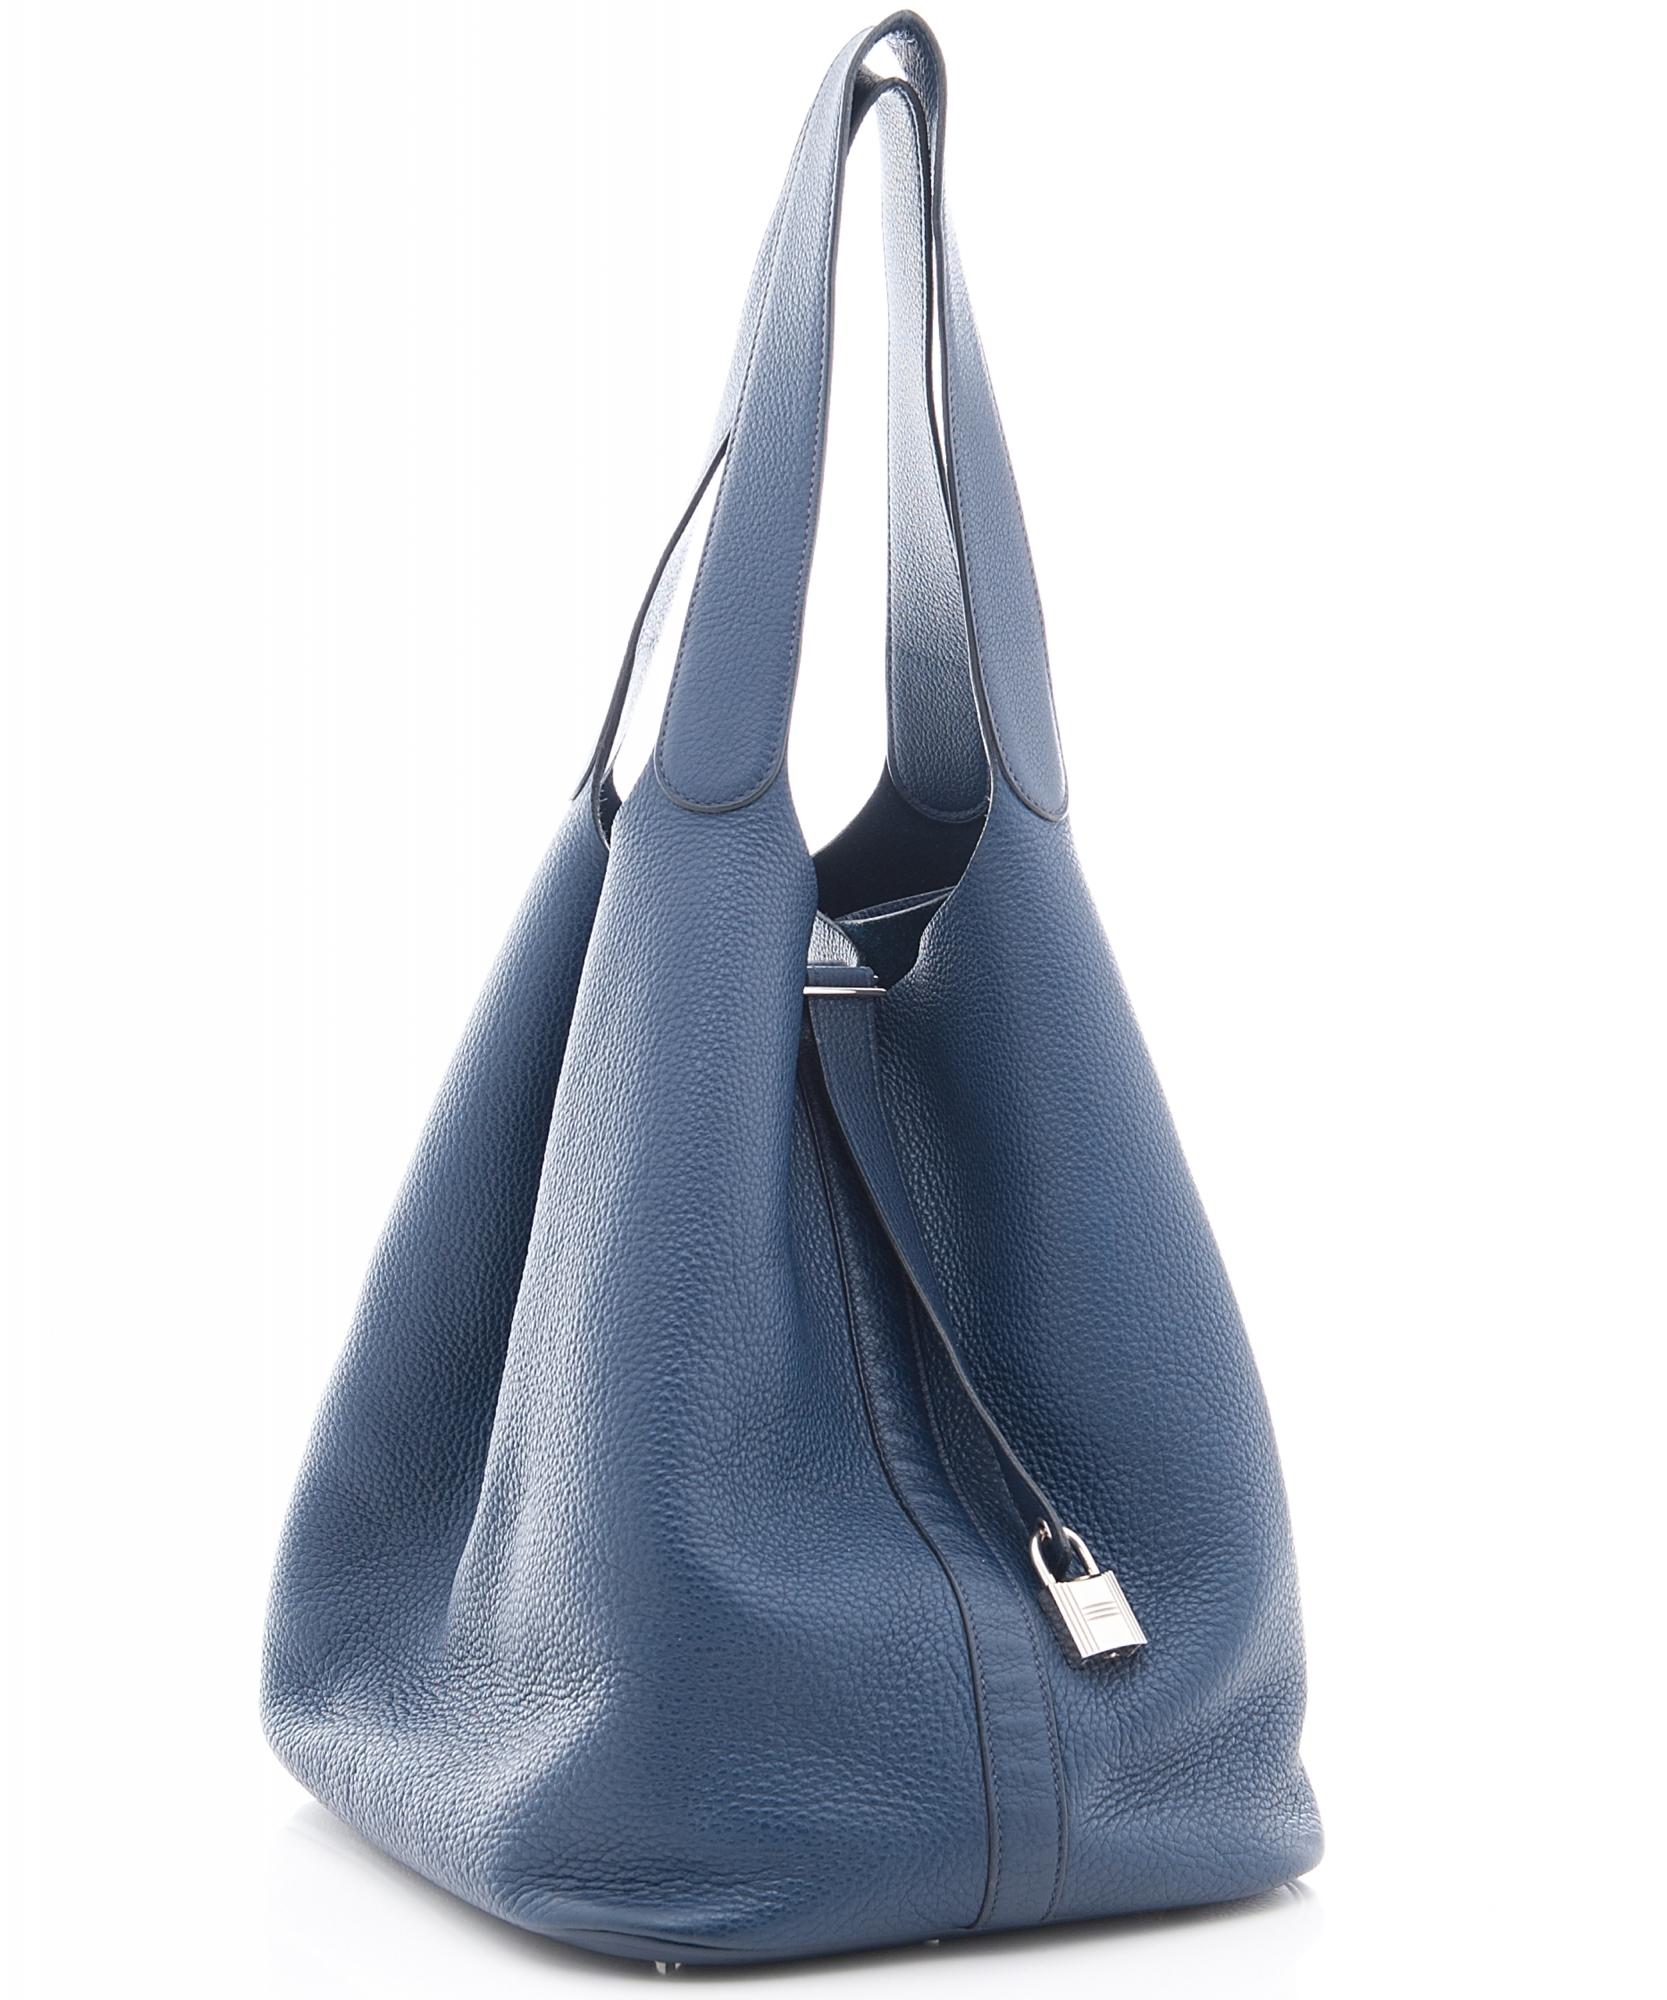 prada saffiano promenade handbag nero - hermes clemence picotin tgm, inexpensive clutch purses